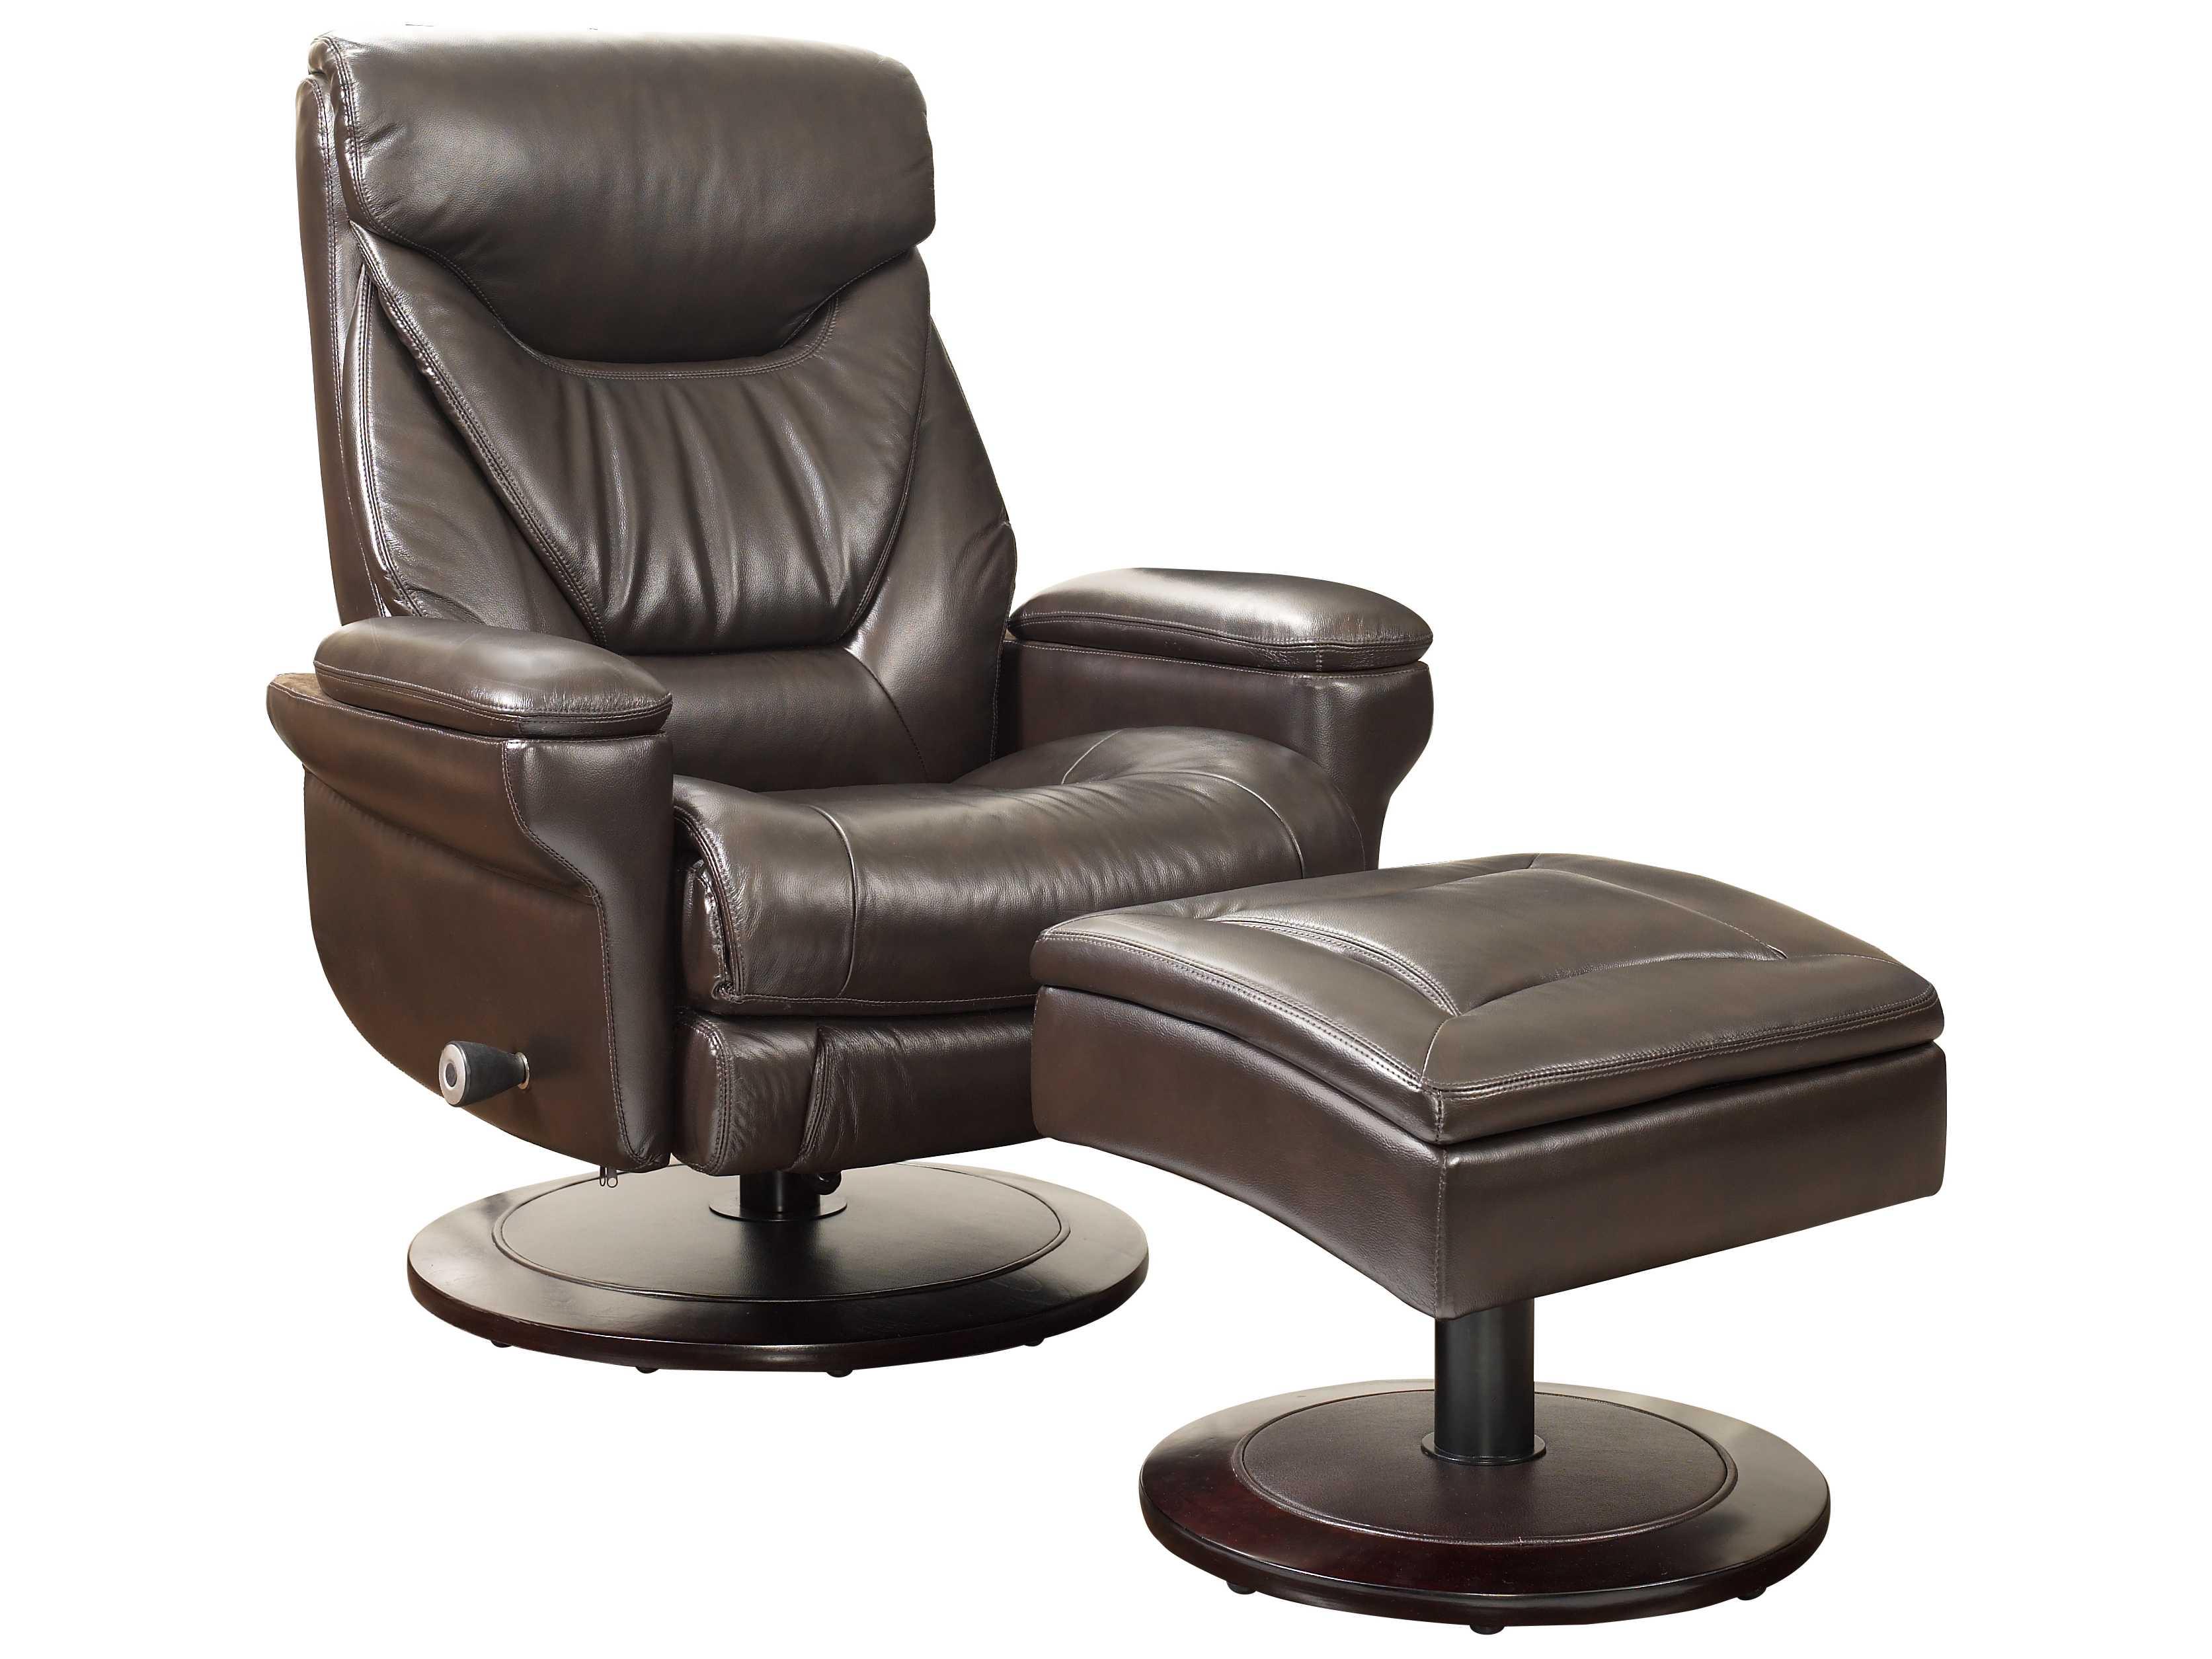 barcalounger pedestal recliners cinna ped recliner. Black Bedroom Furniture Sets. Home Design Ideas